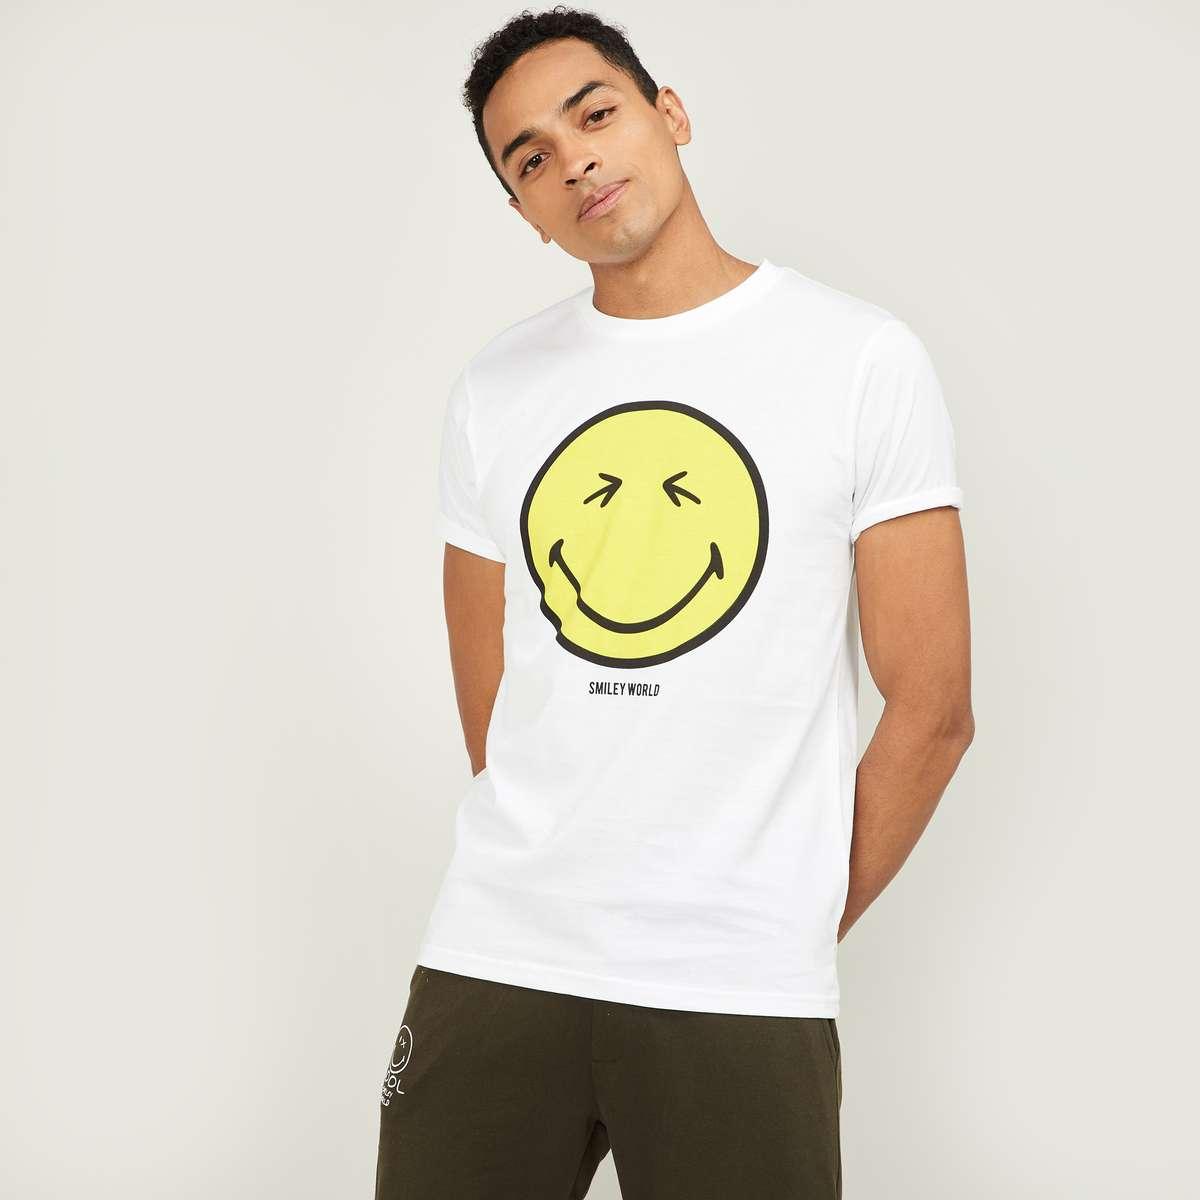 2.SMILEYWORLD Men Graphic Print Regular Fit T-shirt